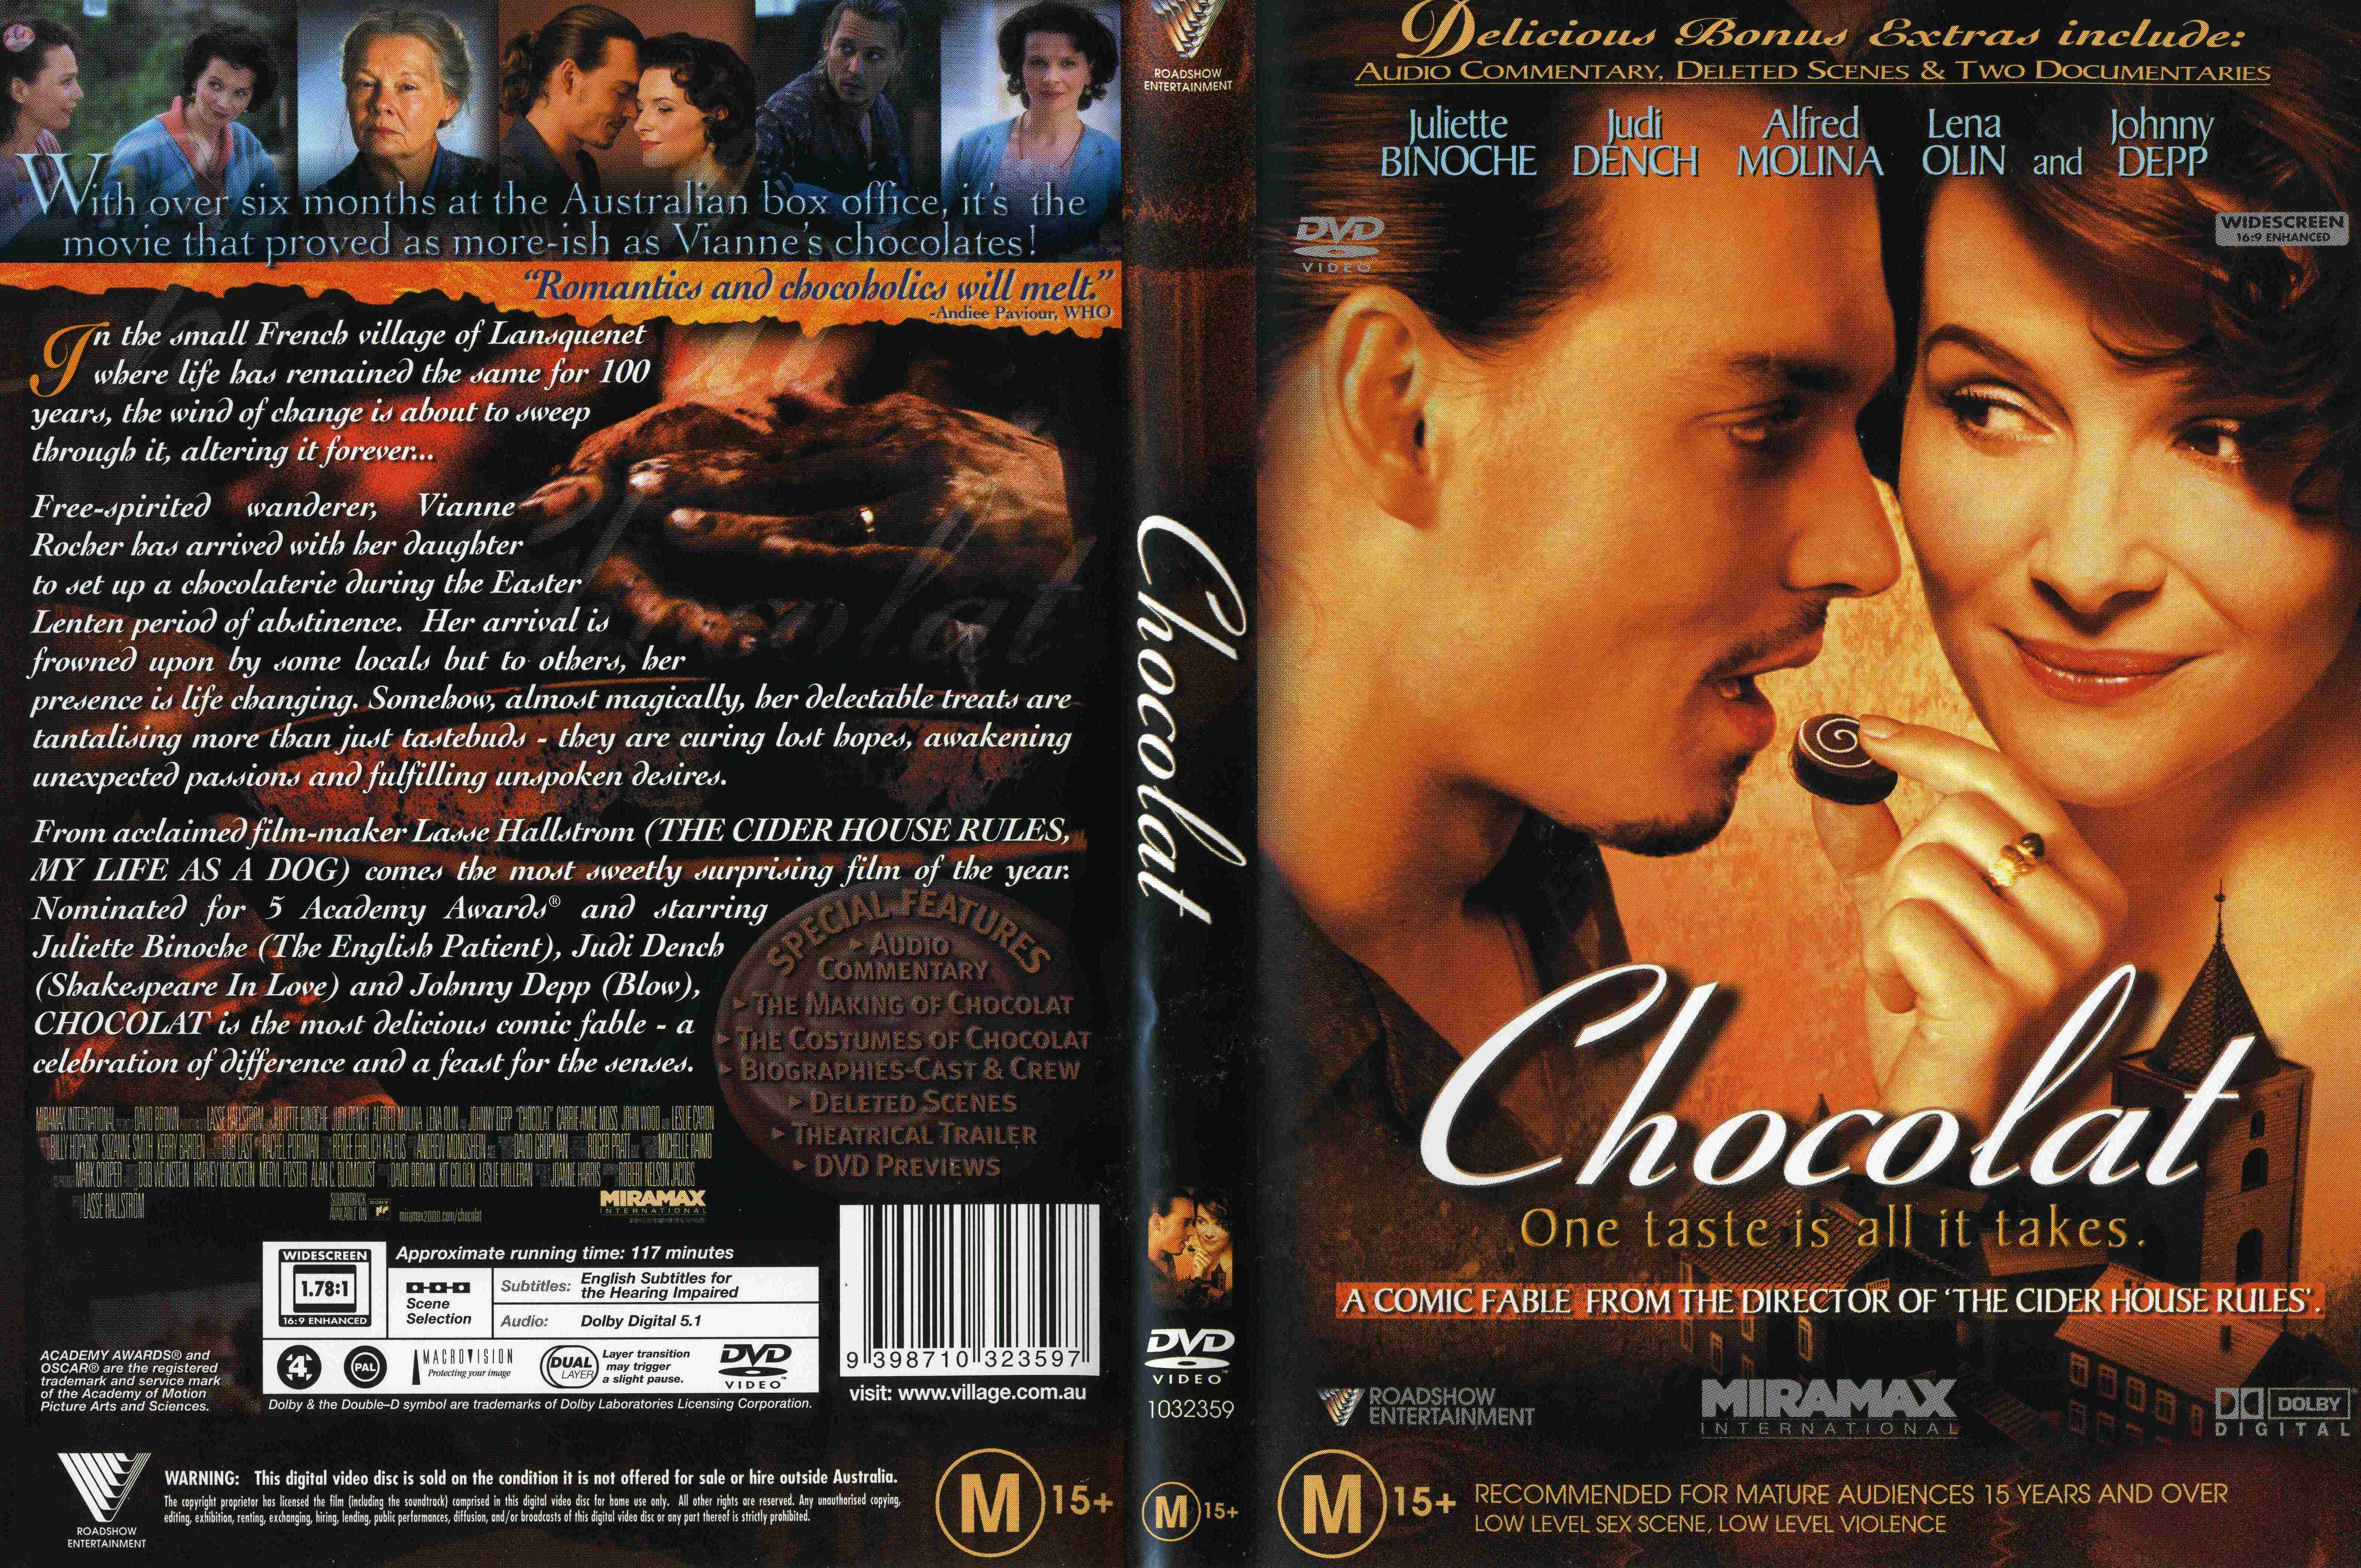 Chocolate Movie 2000 - Pumpkin Chocolate Chip Cookies